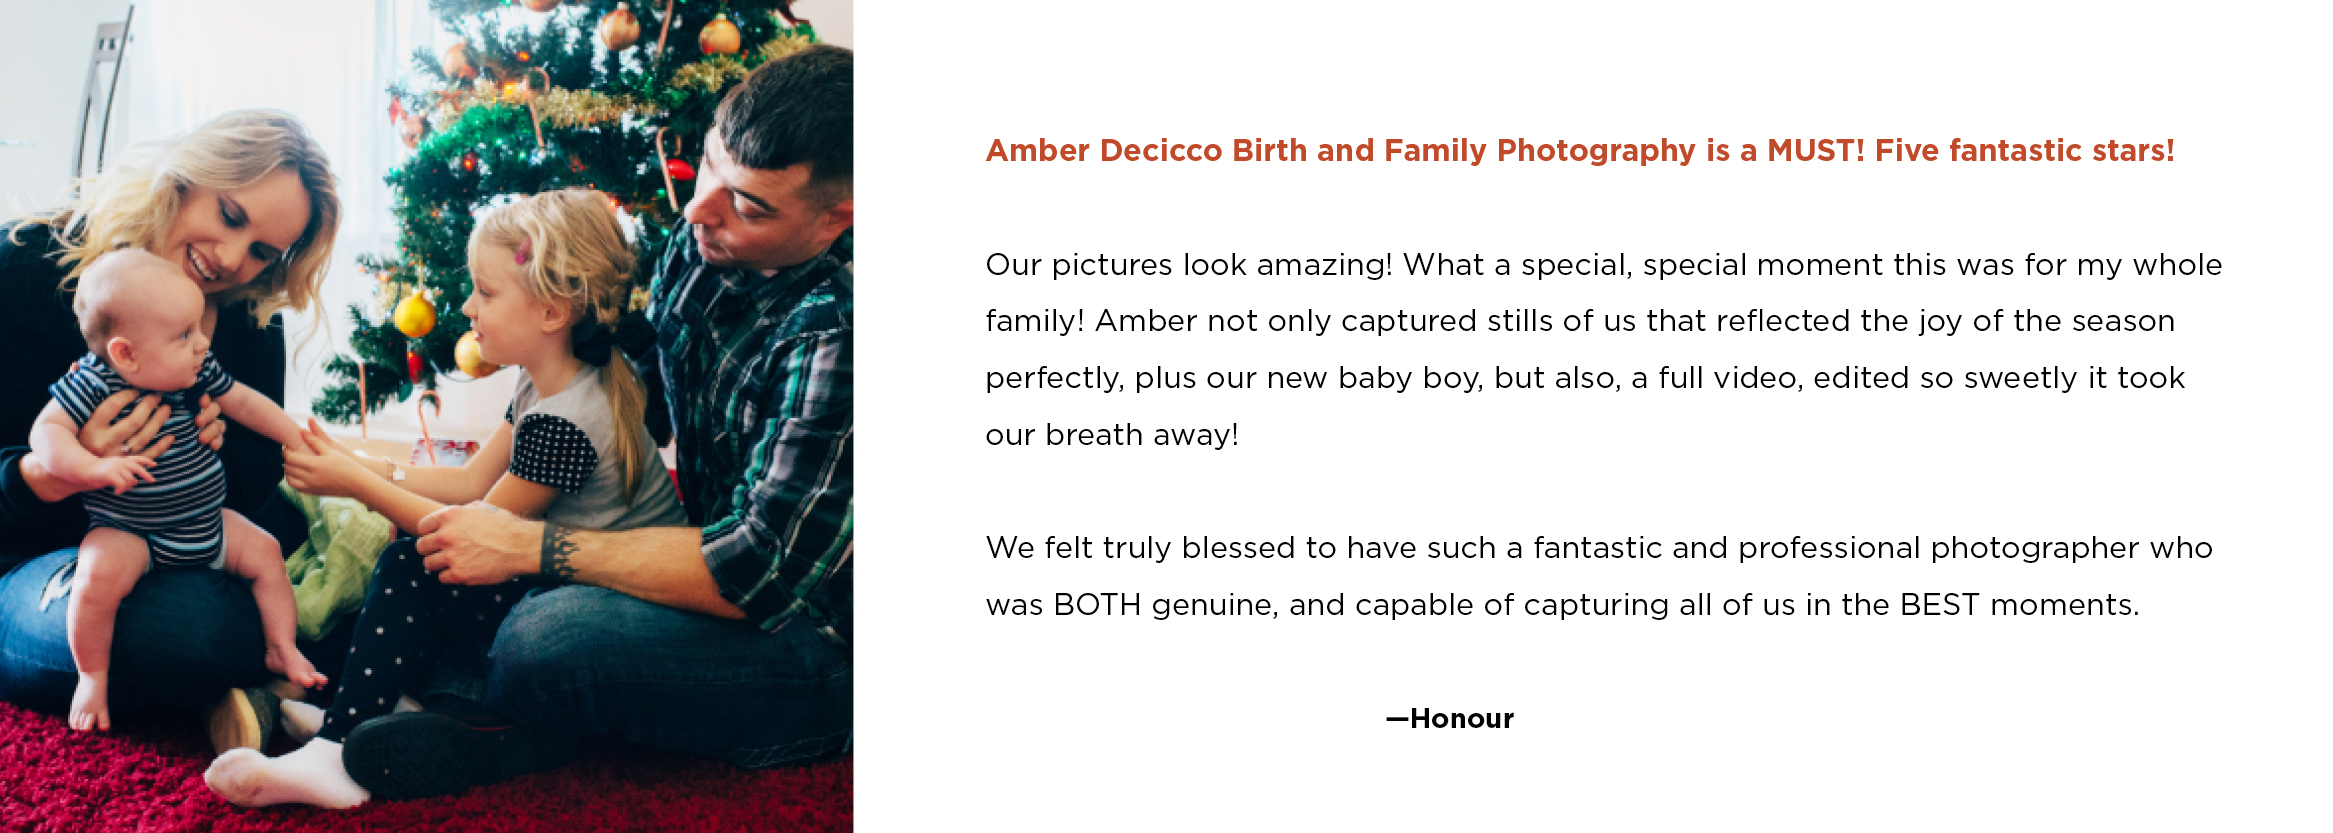 adeciccophoto-reviews12.jpg